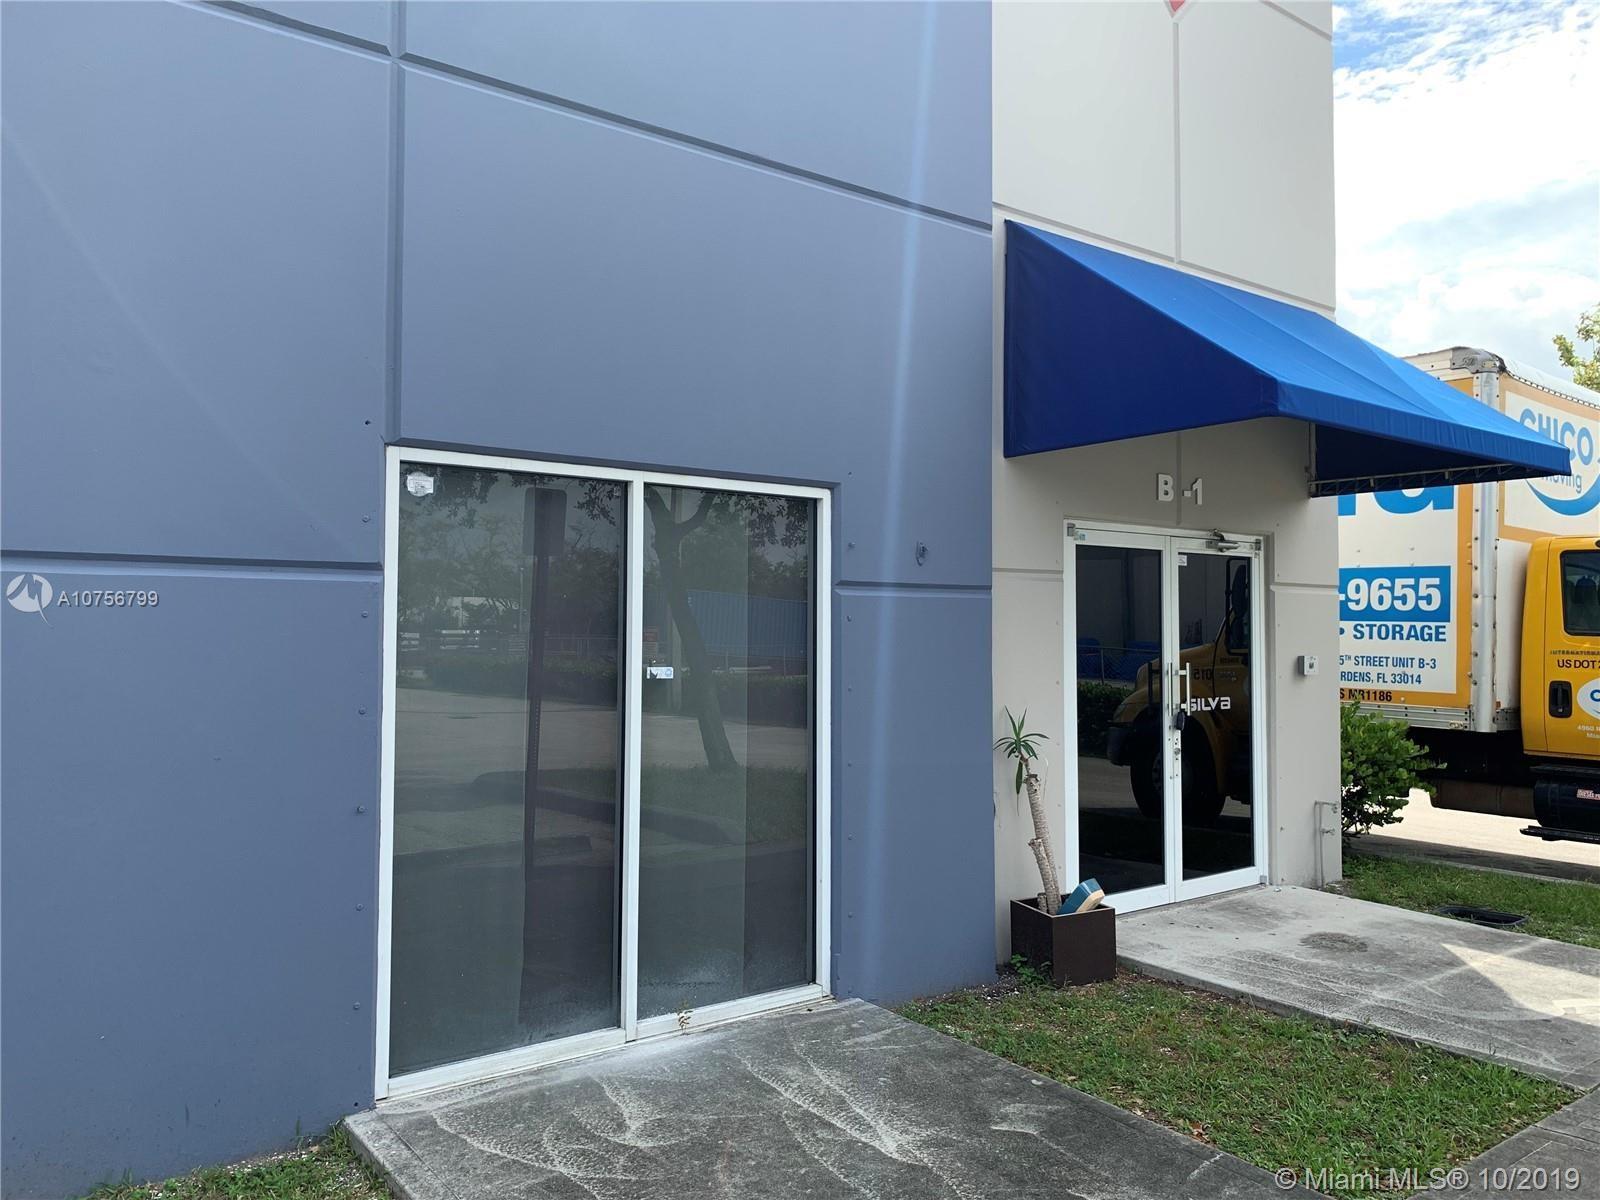 4960 NW 165th Street, Miami Gardens, FL 33014